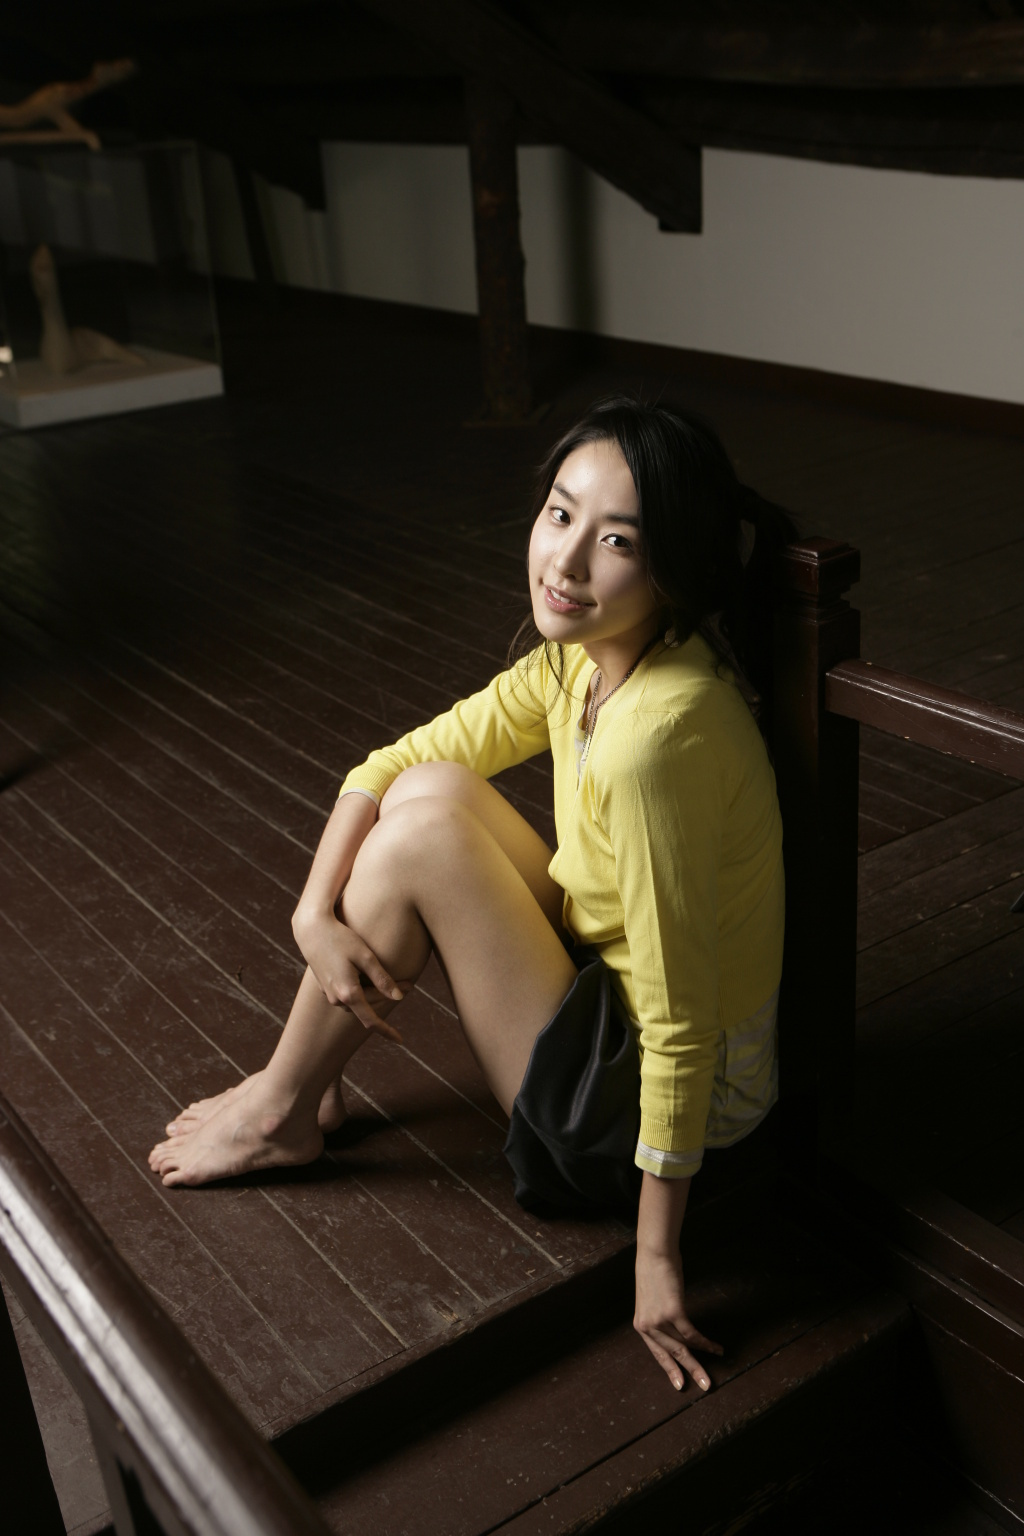 Hd Wallpaper Japanese Girl Pics And Fun Things Around Korea Korea Japan China